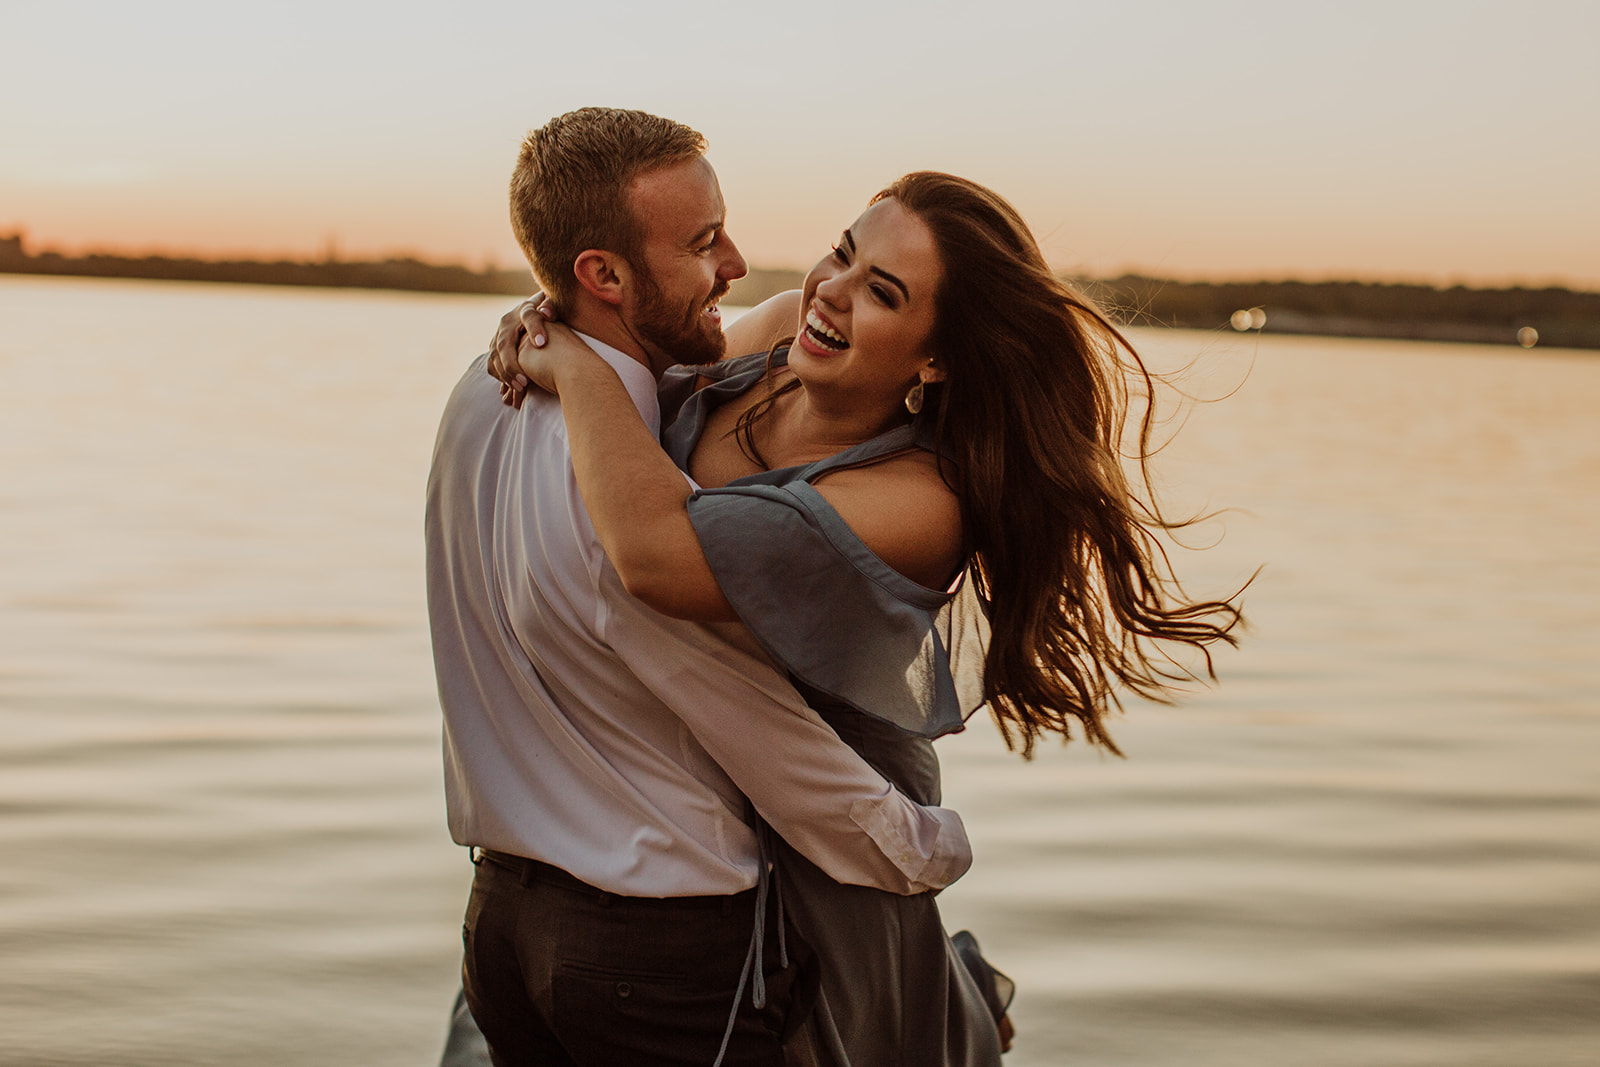 Sydney & Kyle's Peoria Riverfront Engagement - Peoria, IL